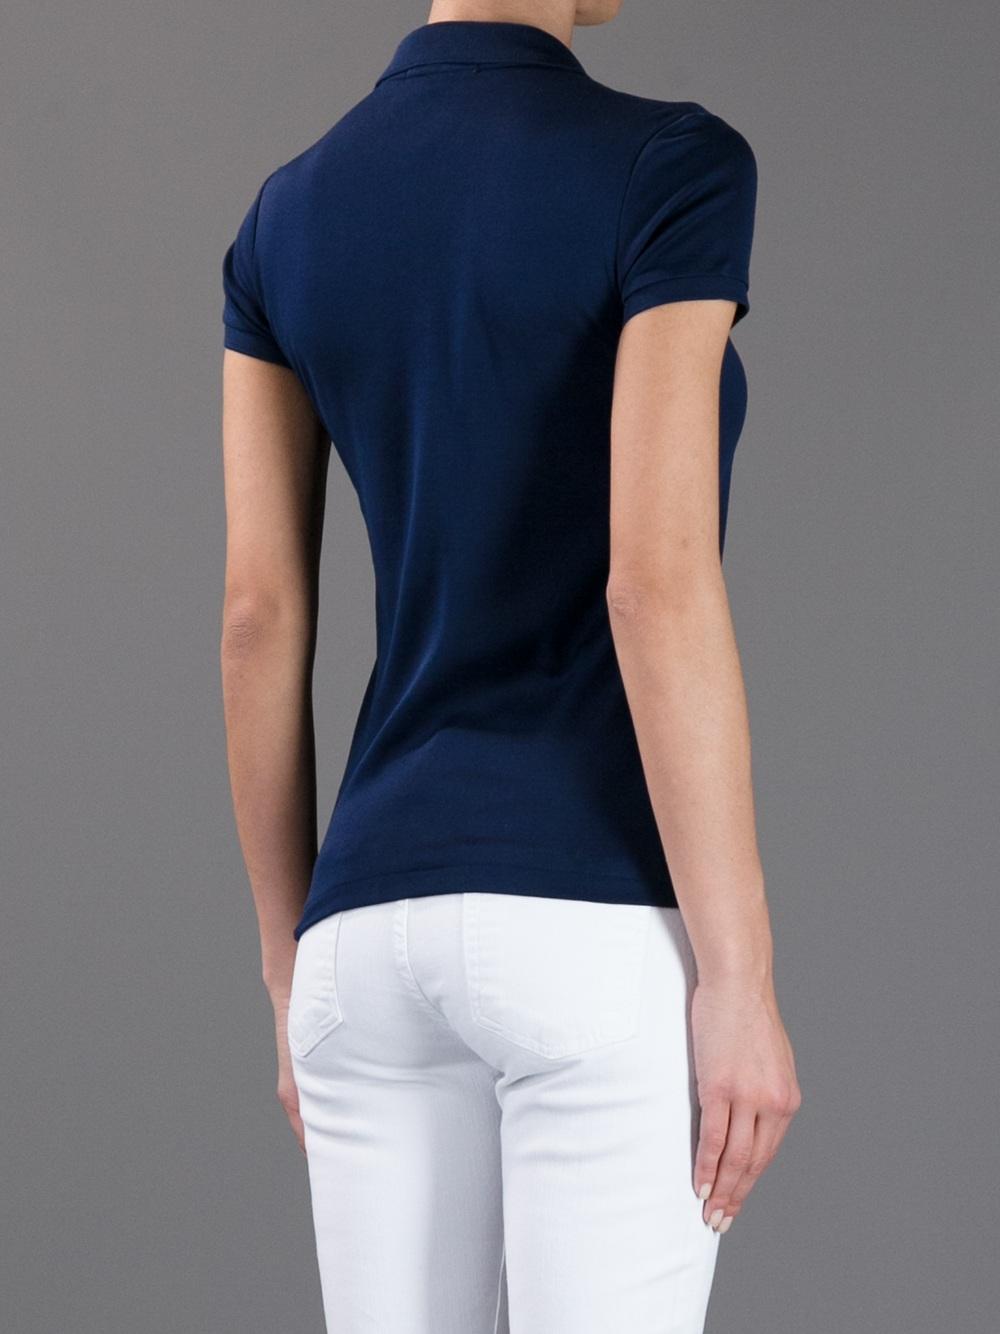 Ralph lauren black label logo polo shirt in blue lyst for Ralph lauren black label polo shirt